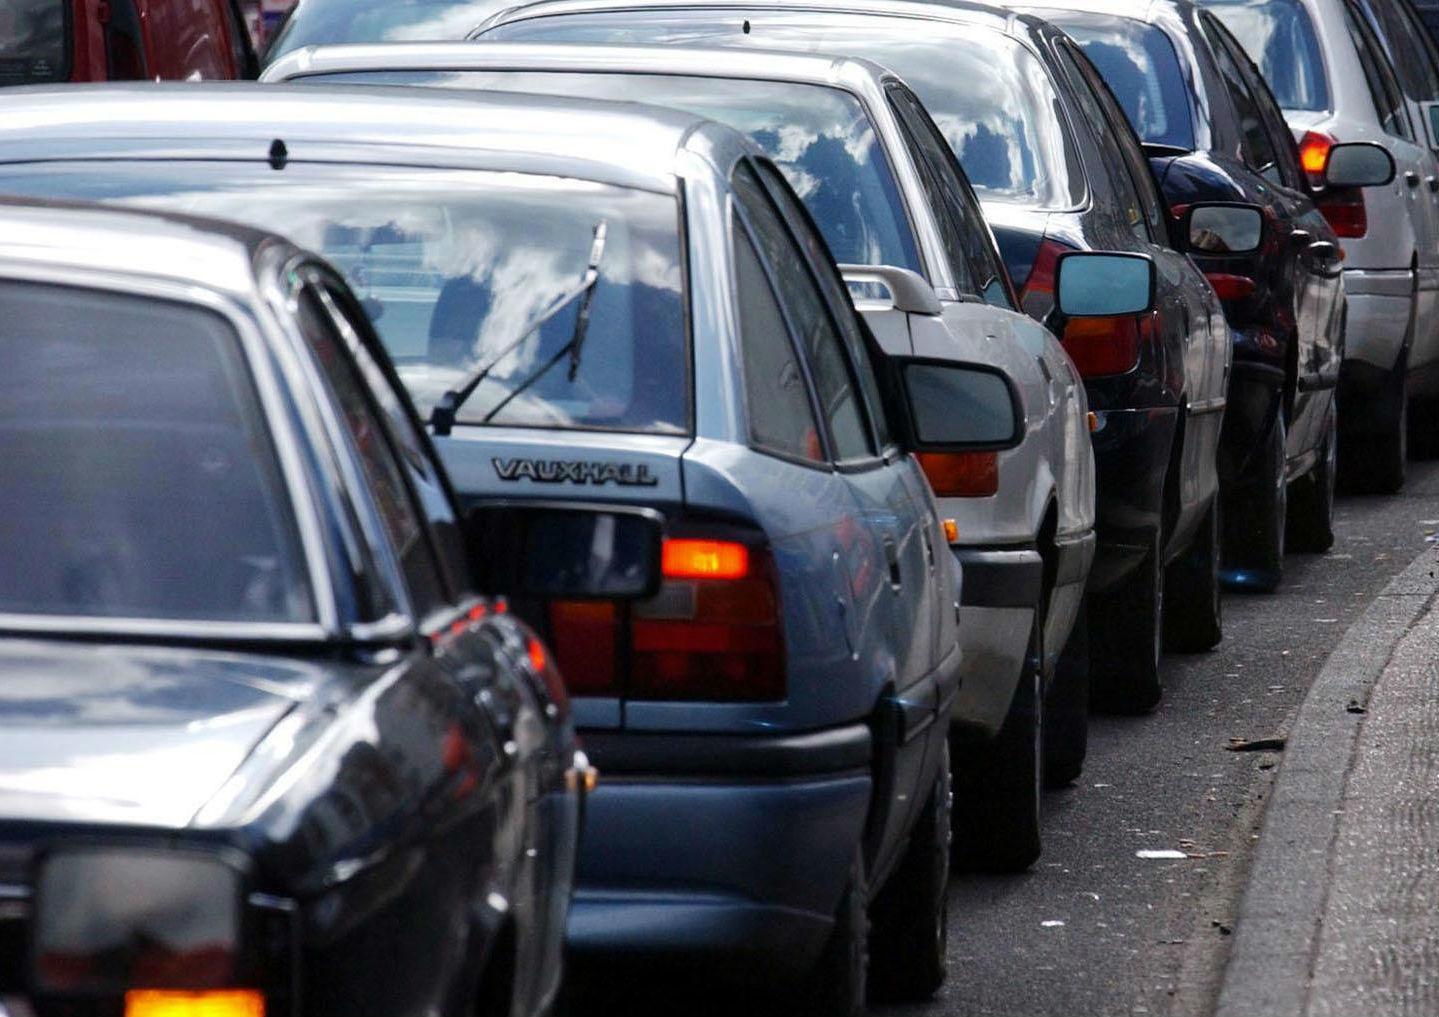 Road closure for resurfacing leading to tailbacks